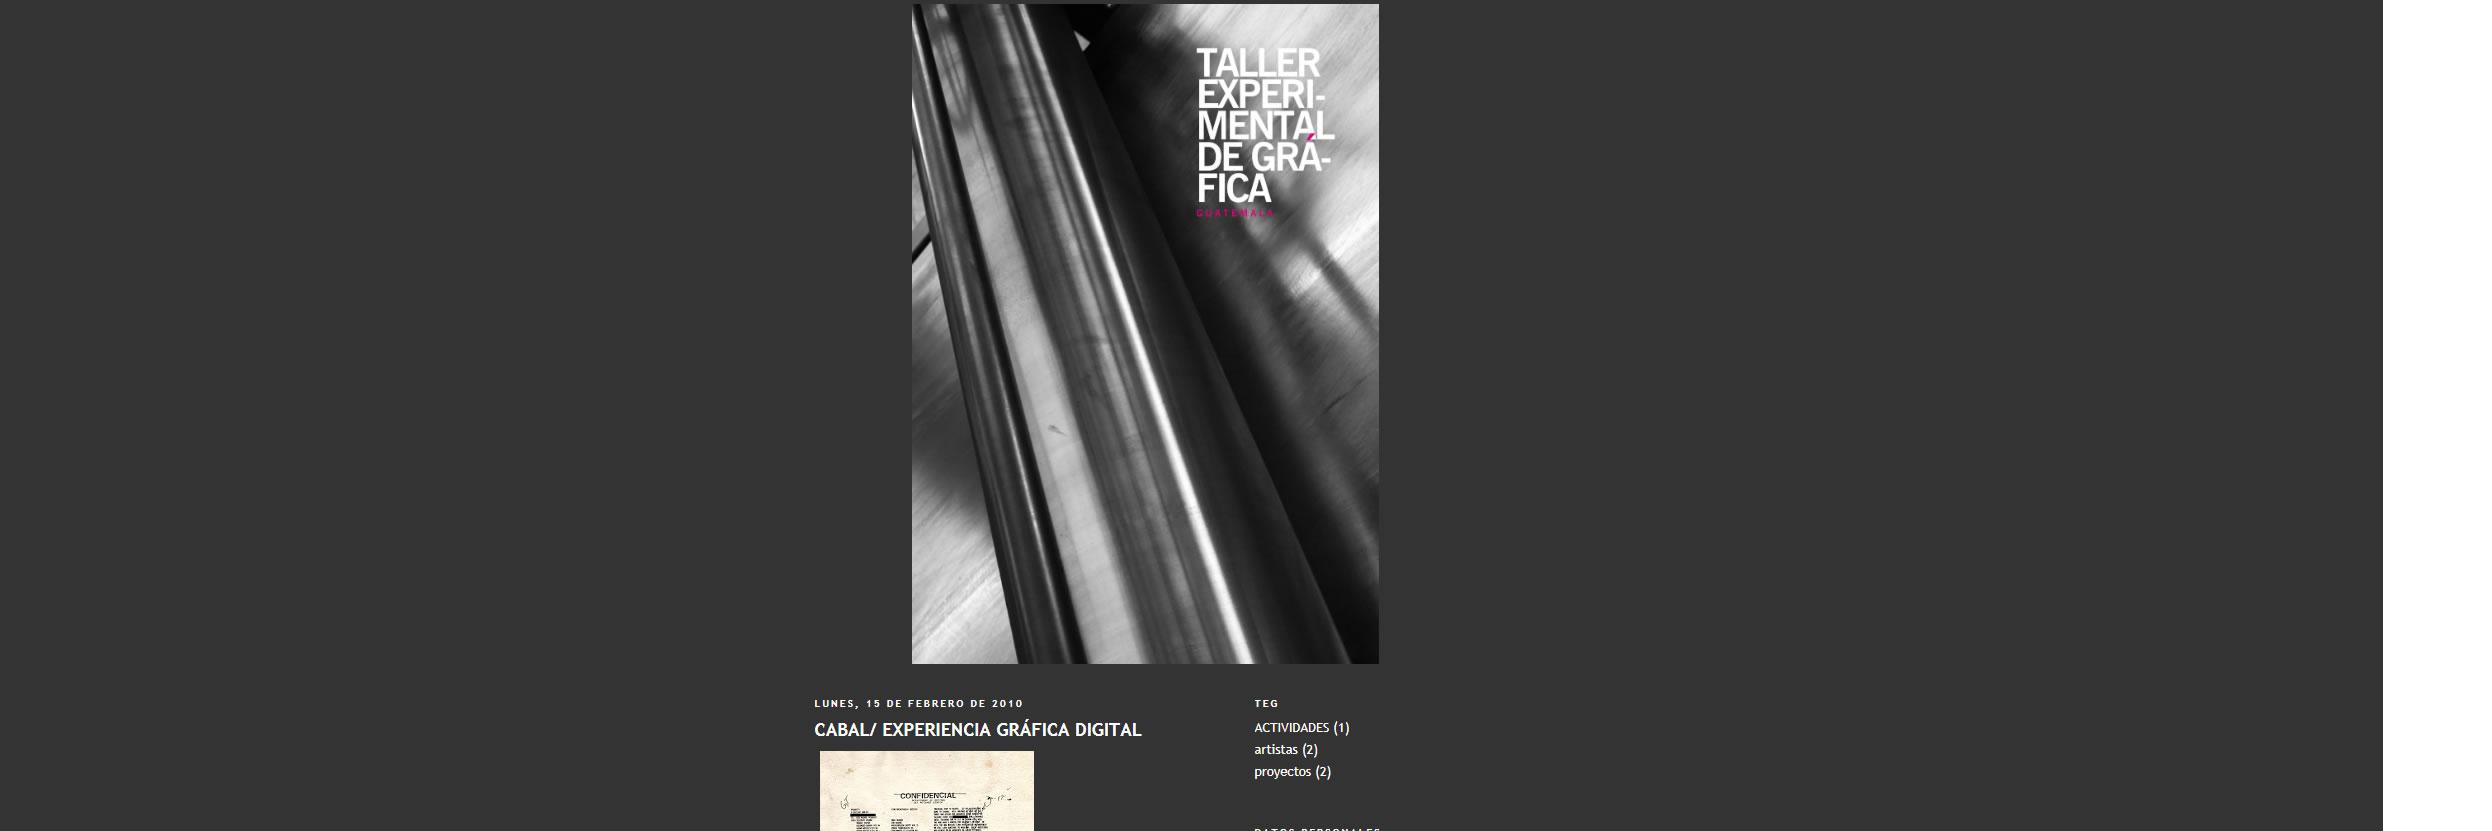 taller_experimental_de_grafica_galeria_de_gravura